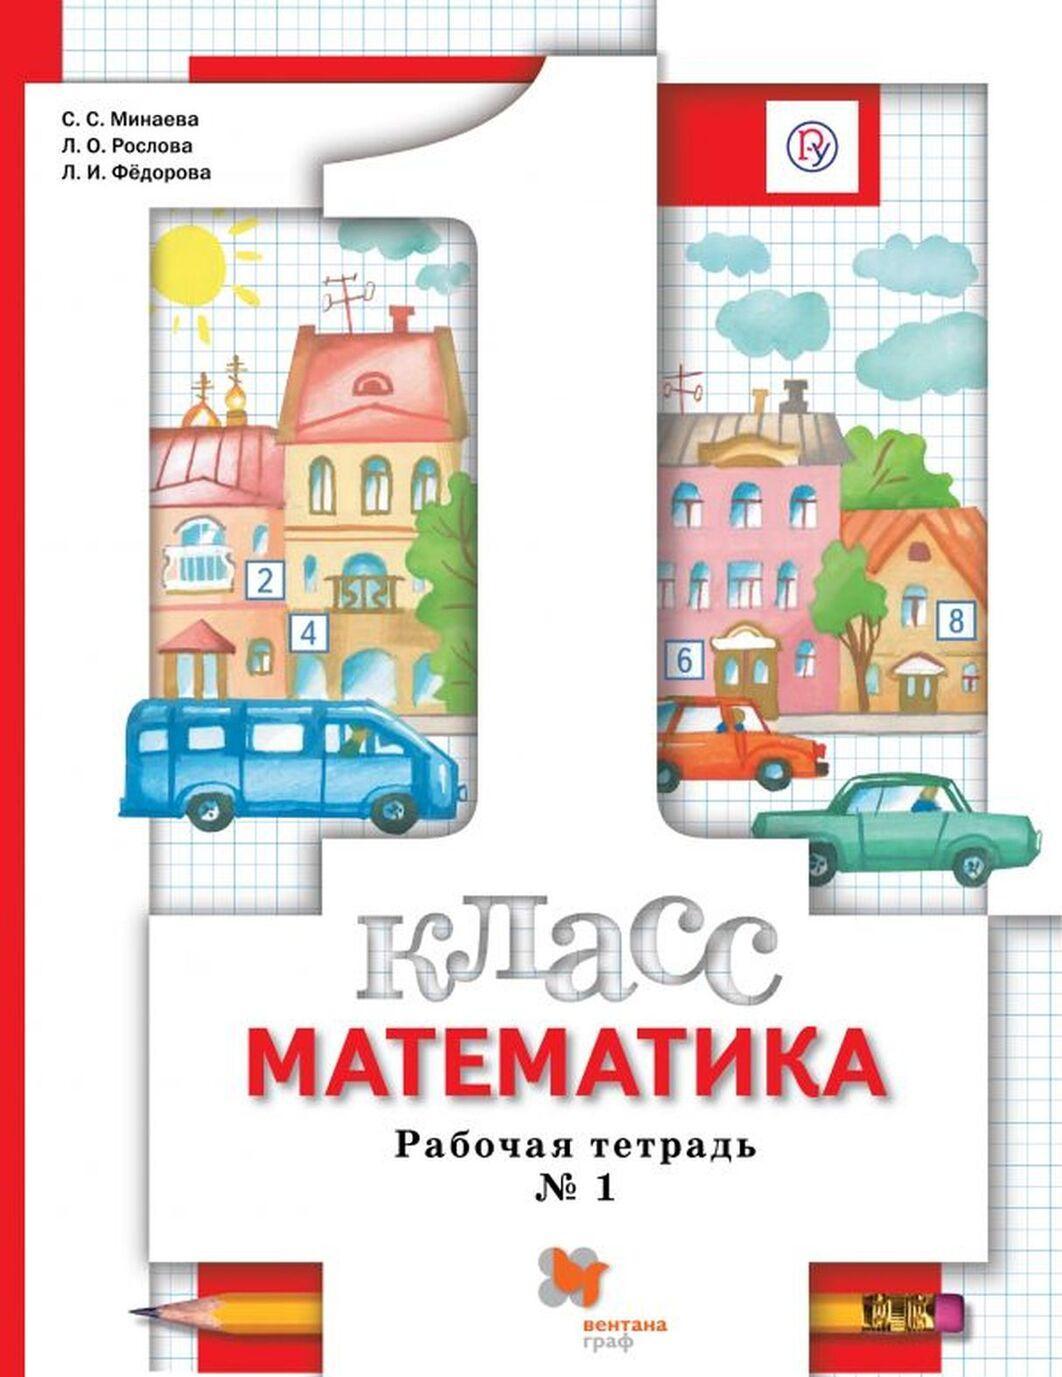 Matematika. 1klass. Rabochaja tetrad № 1